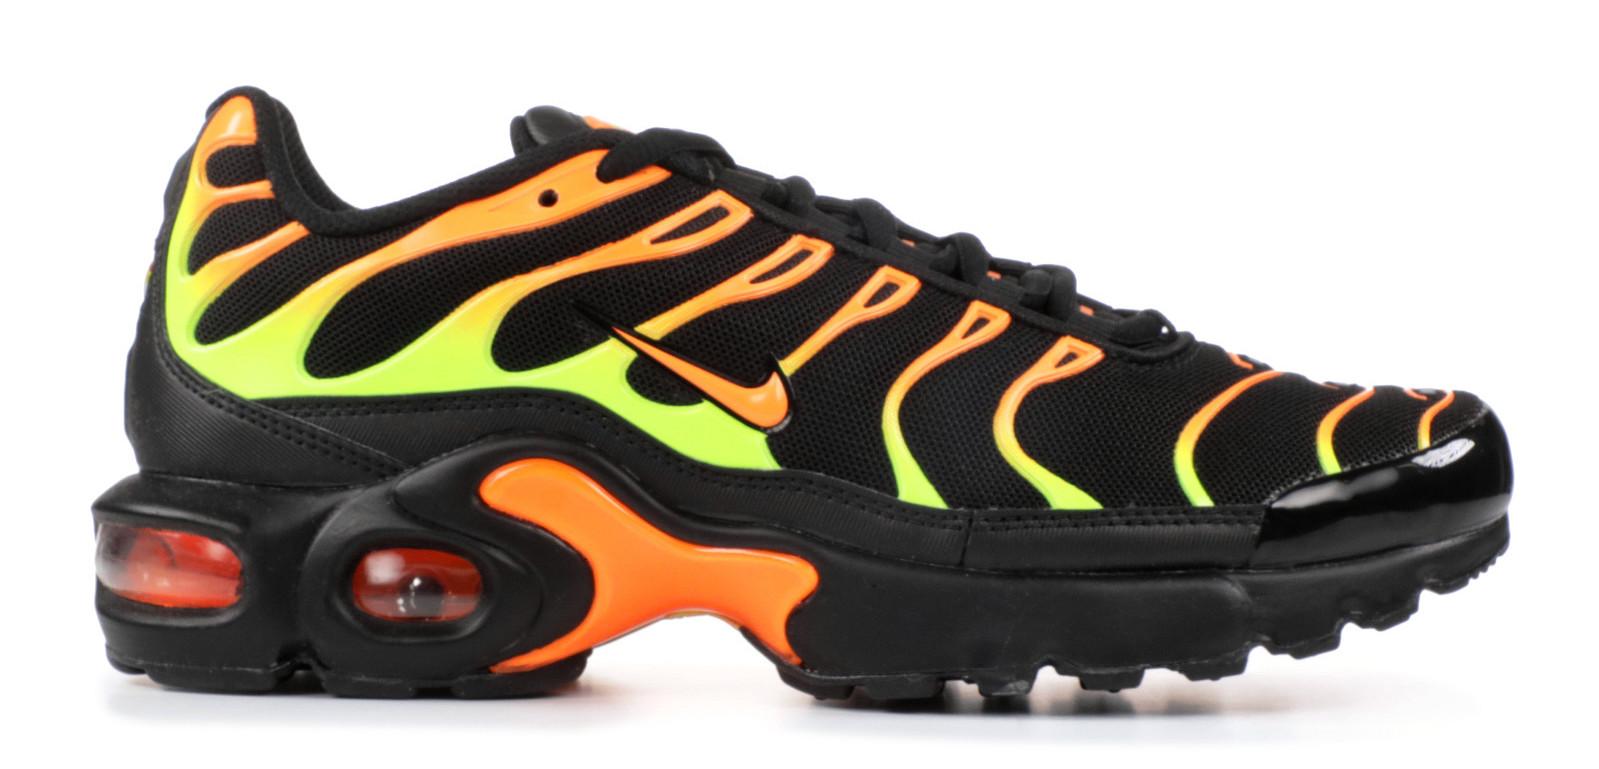 Nike(ナイキ) Air Max Plus Black Volt